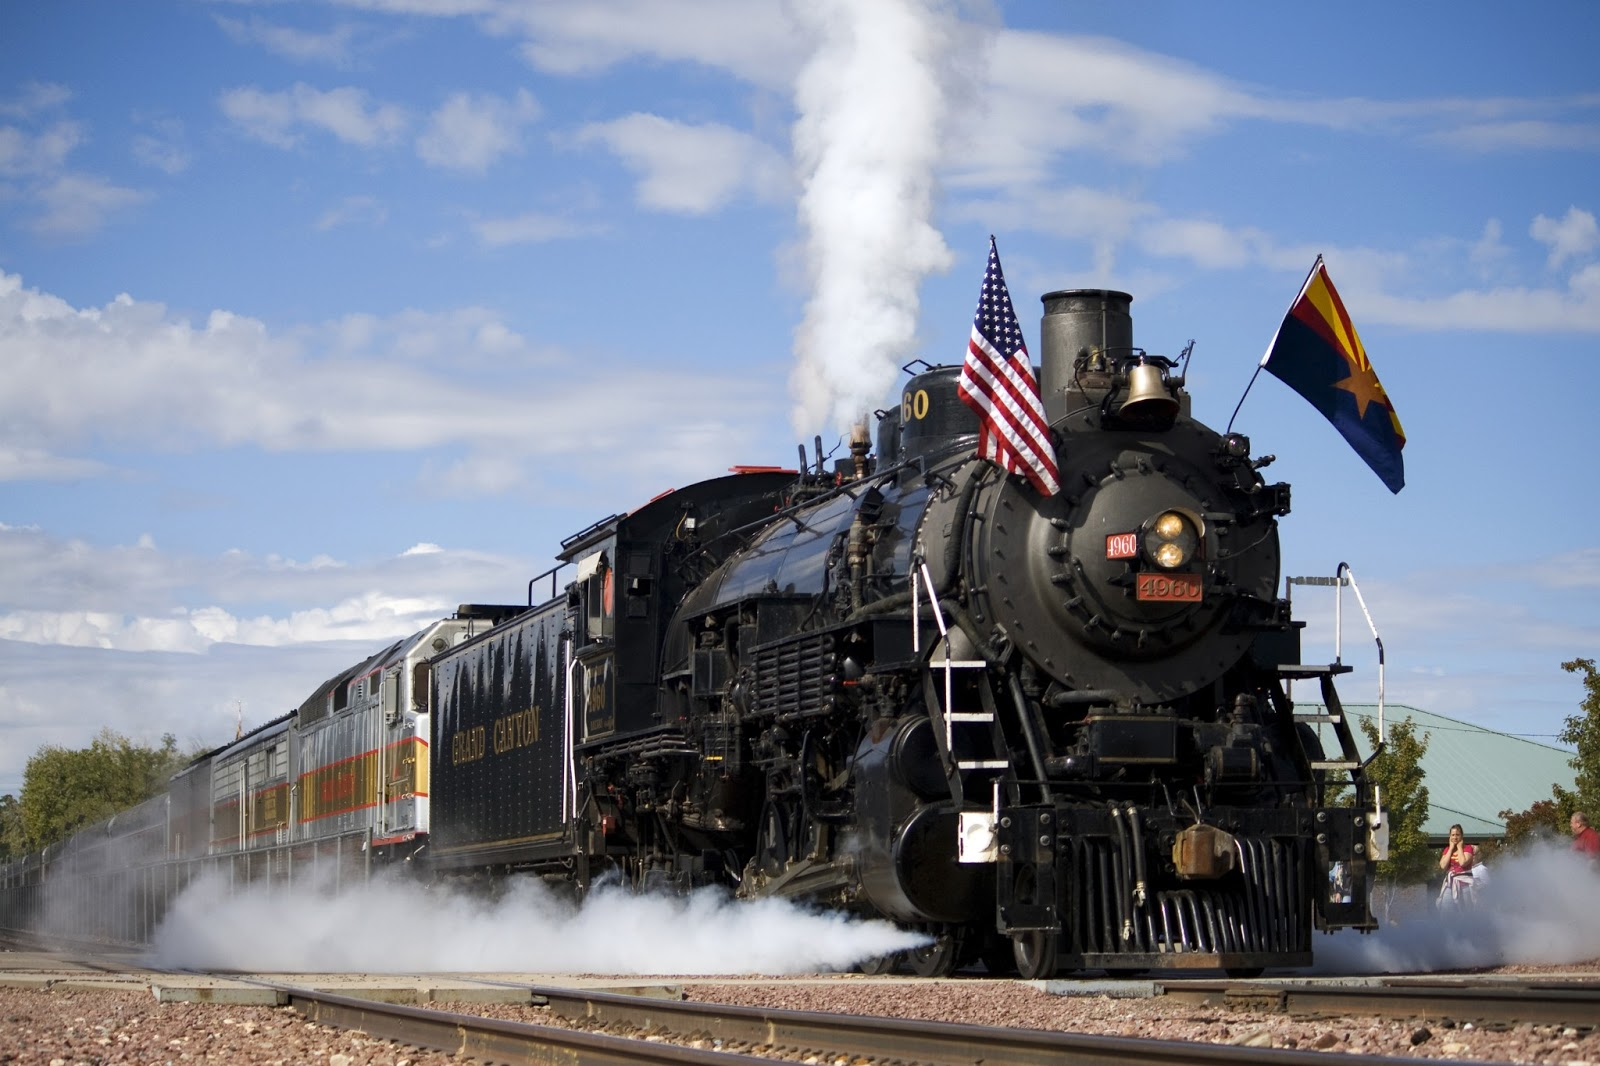 Grand Canyon Train Tours Reviews